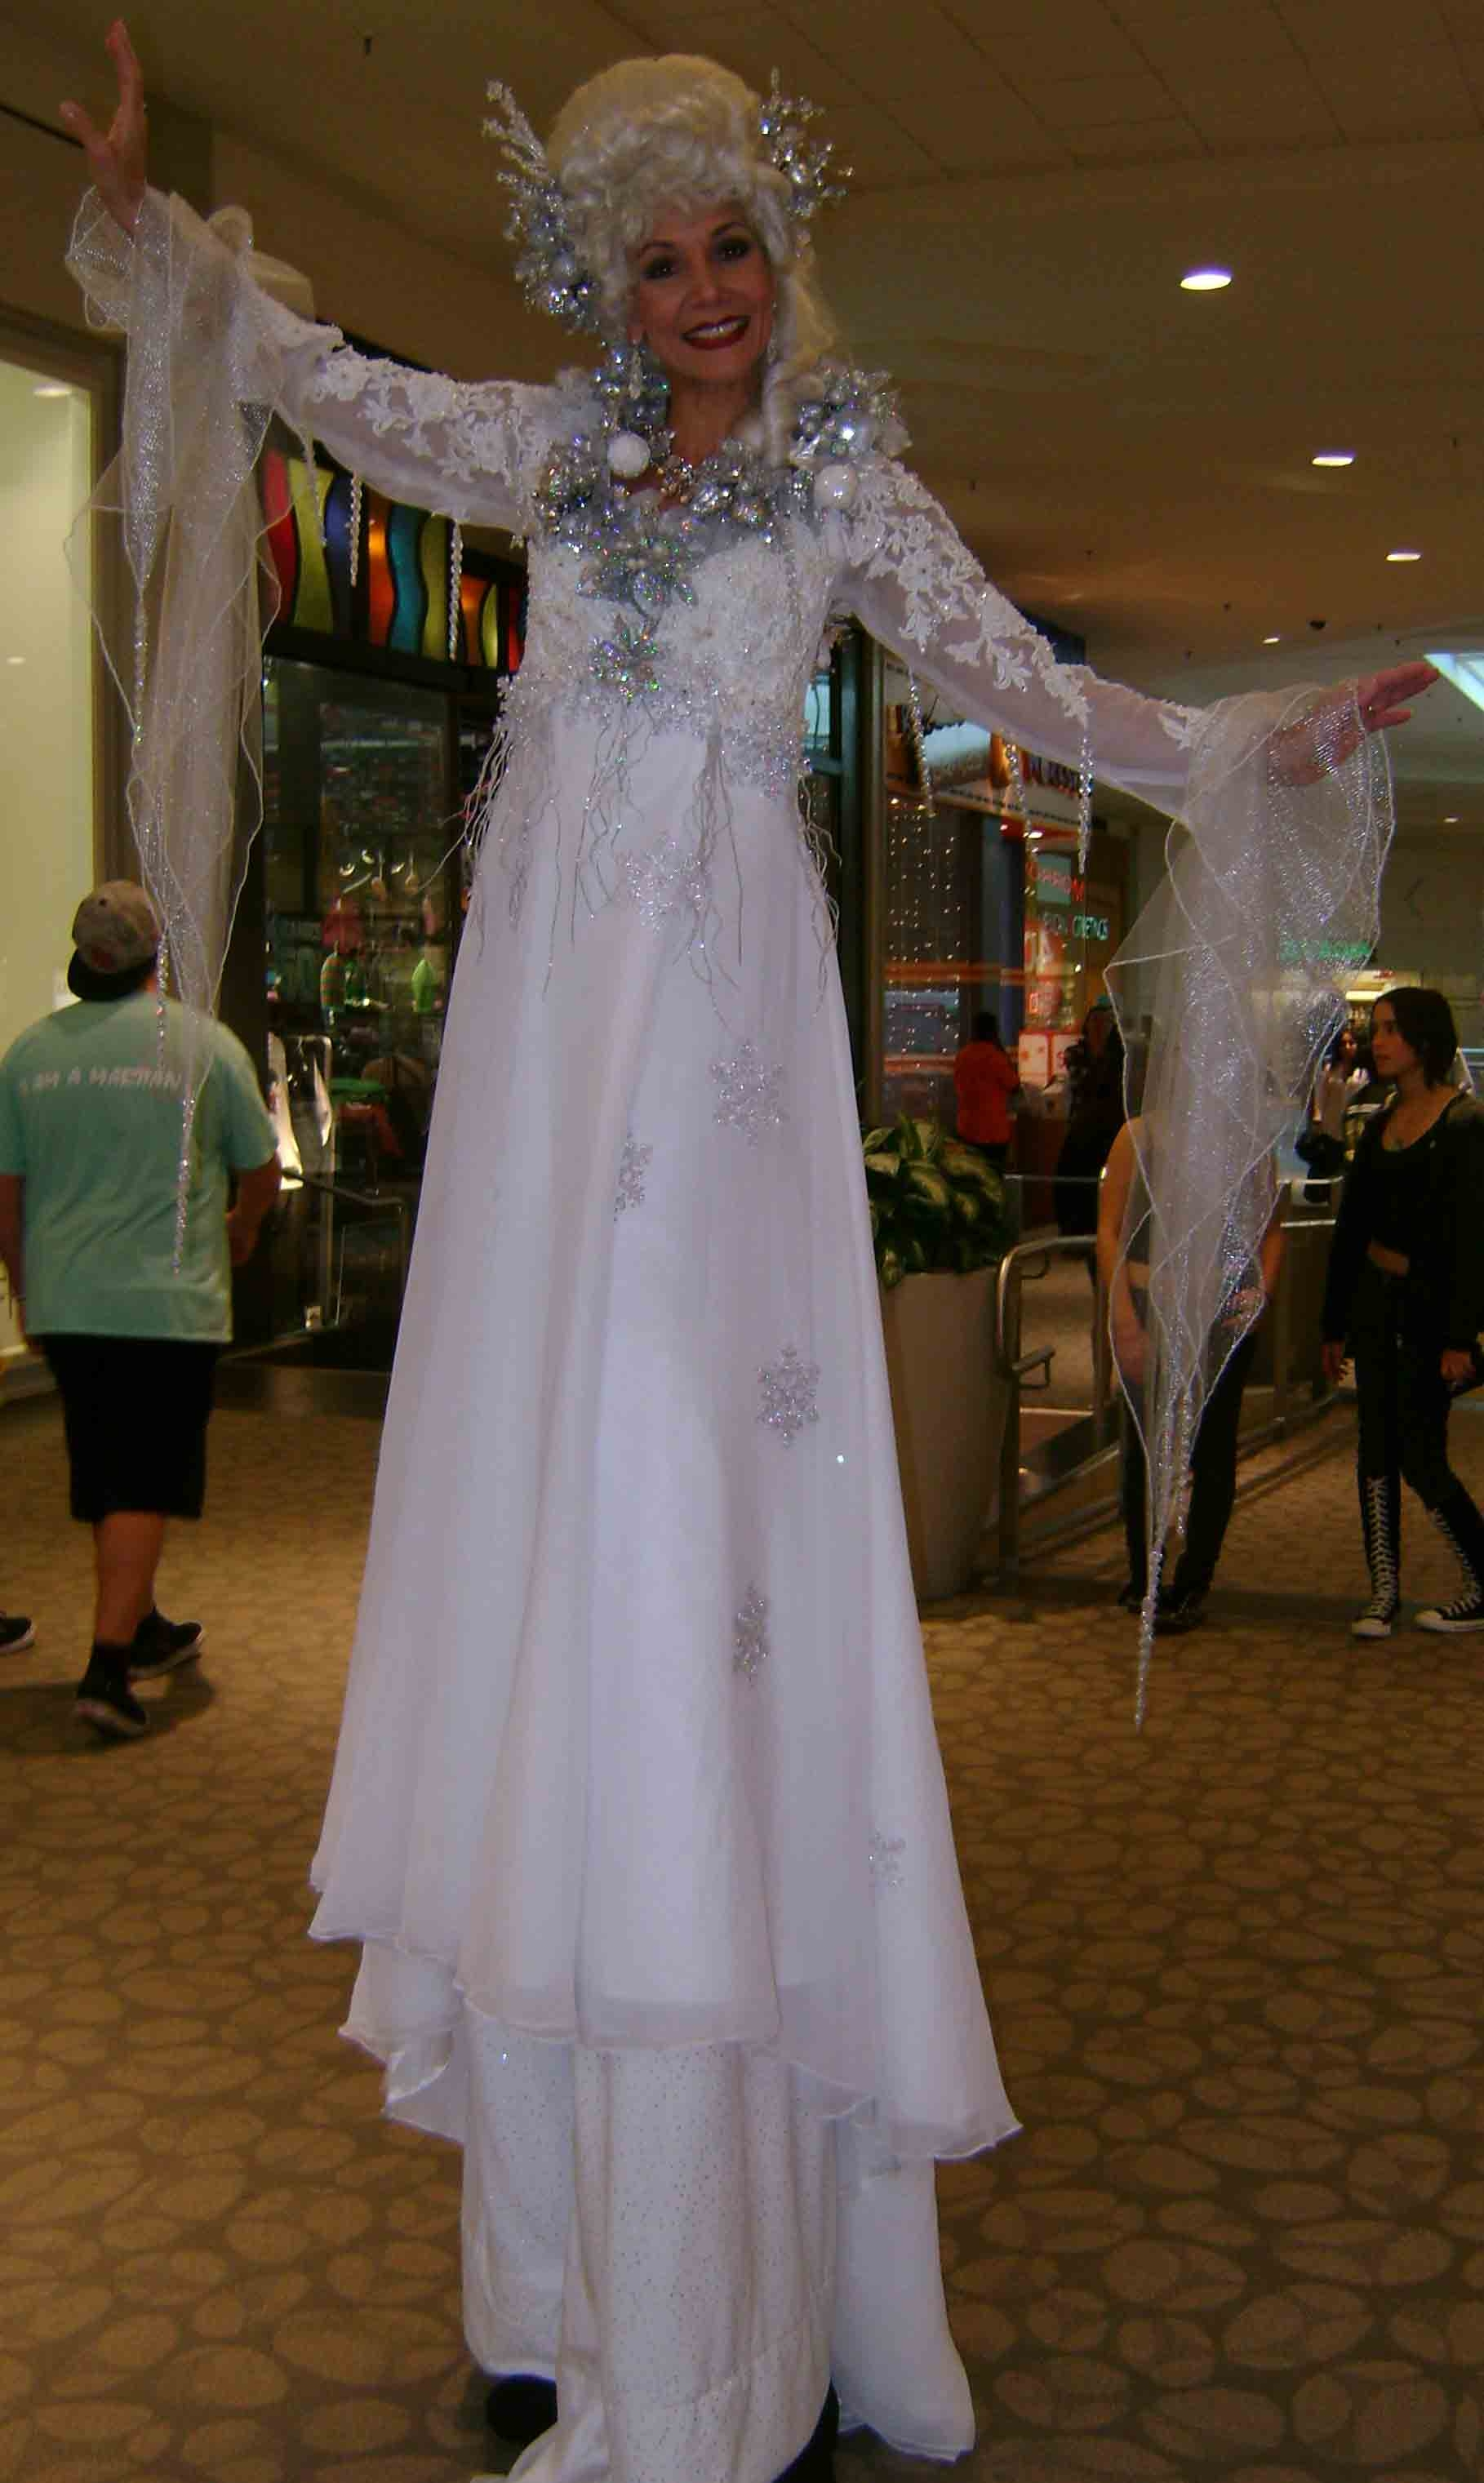 Snow Queen stilt walker